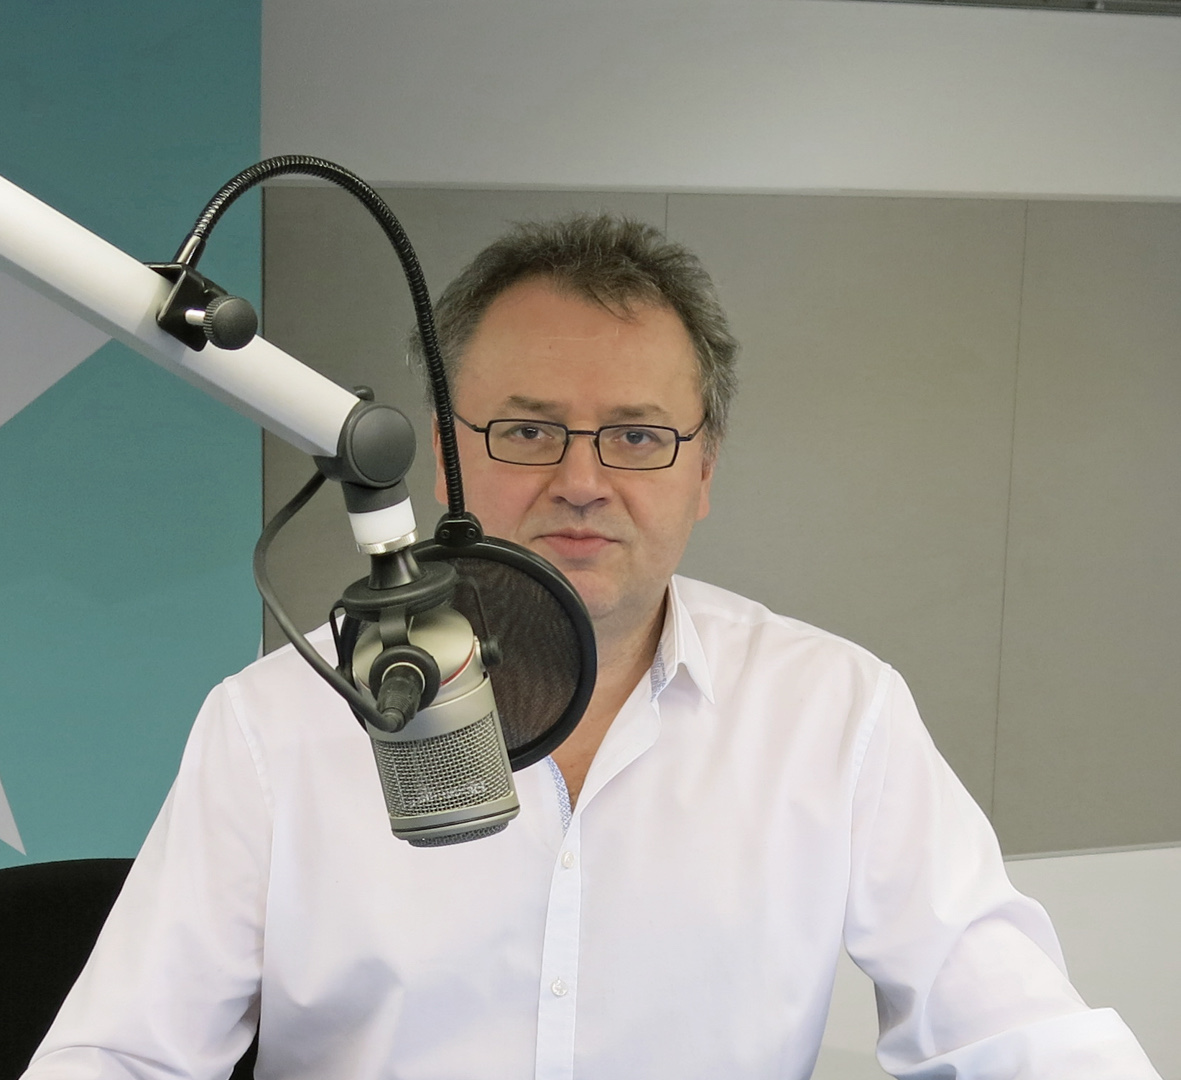 Jacek Tyblewski